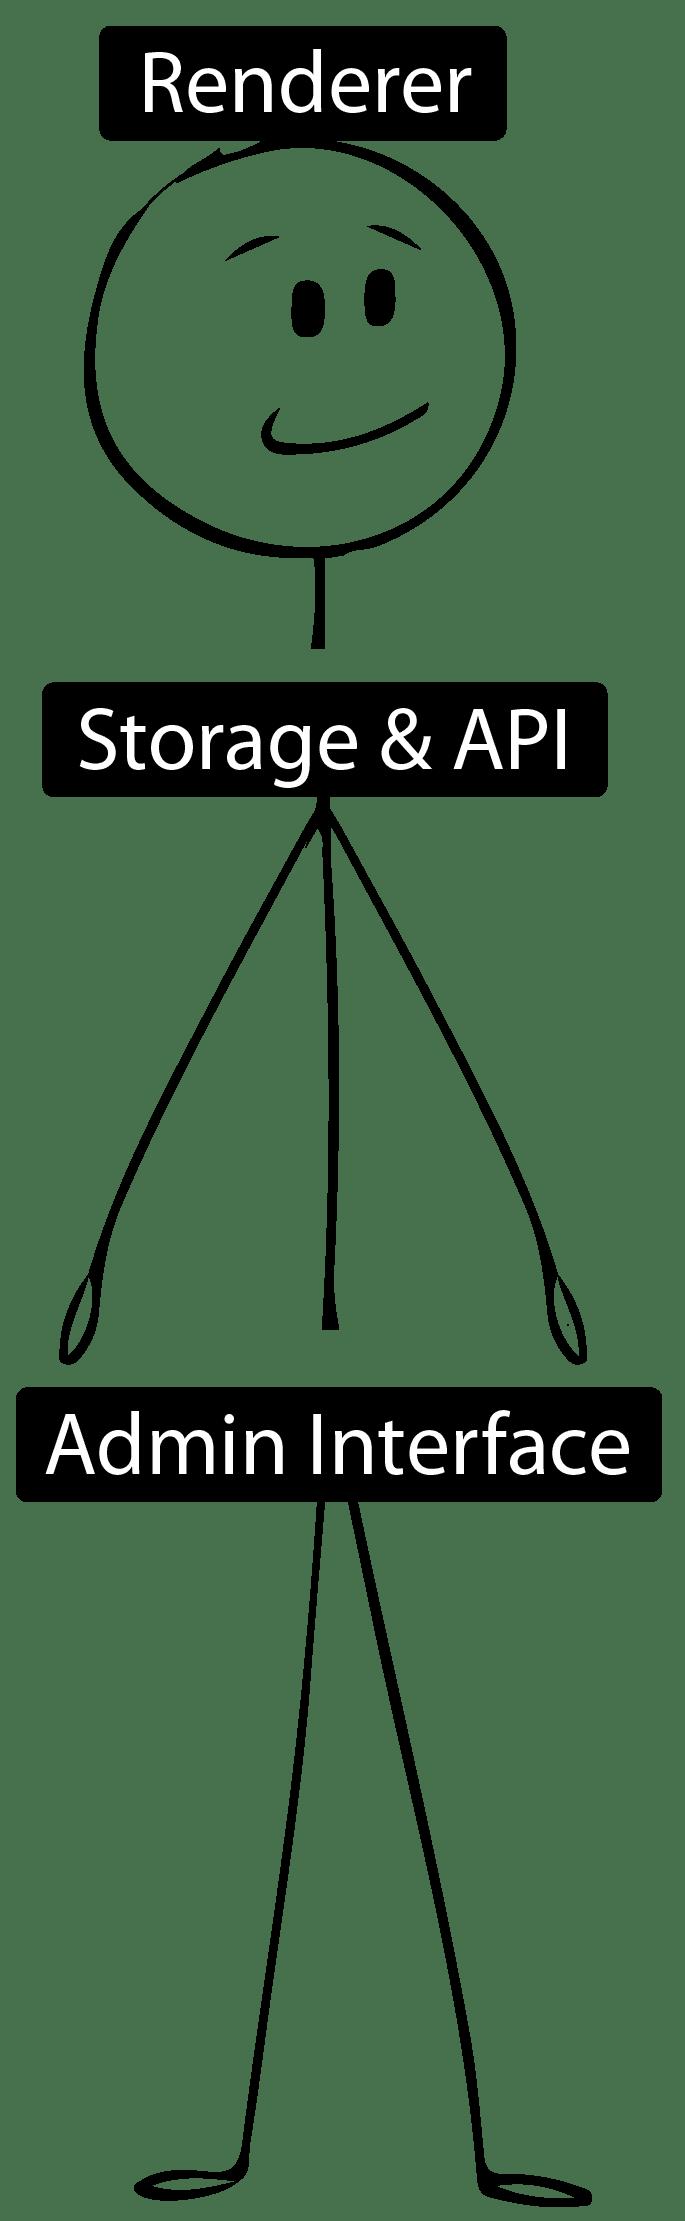 CMS/DMS diagram by Monika Popova